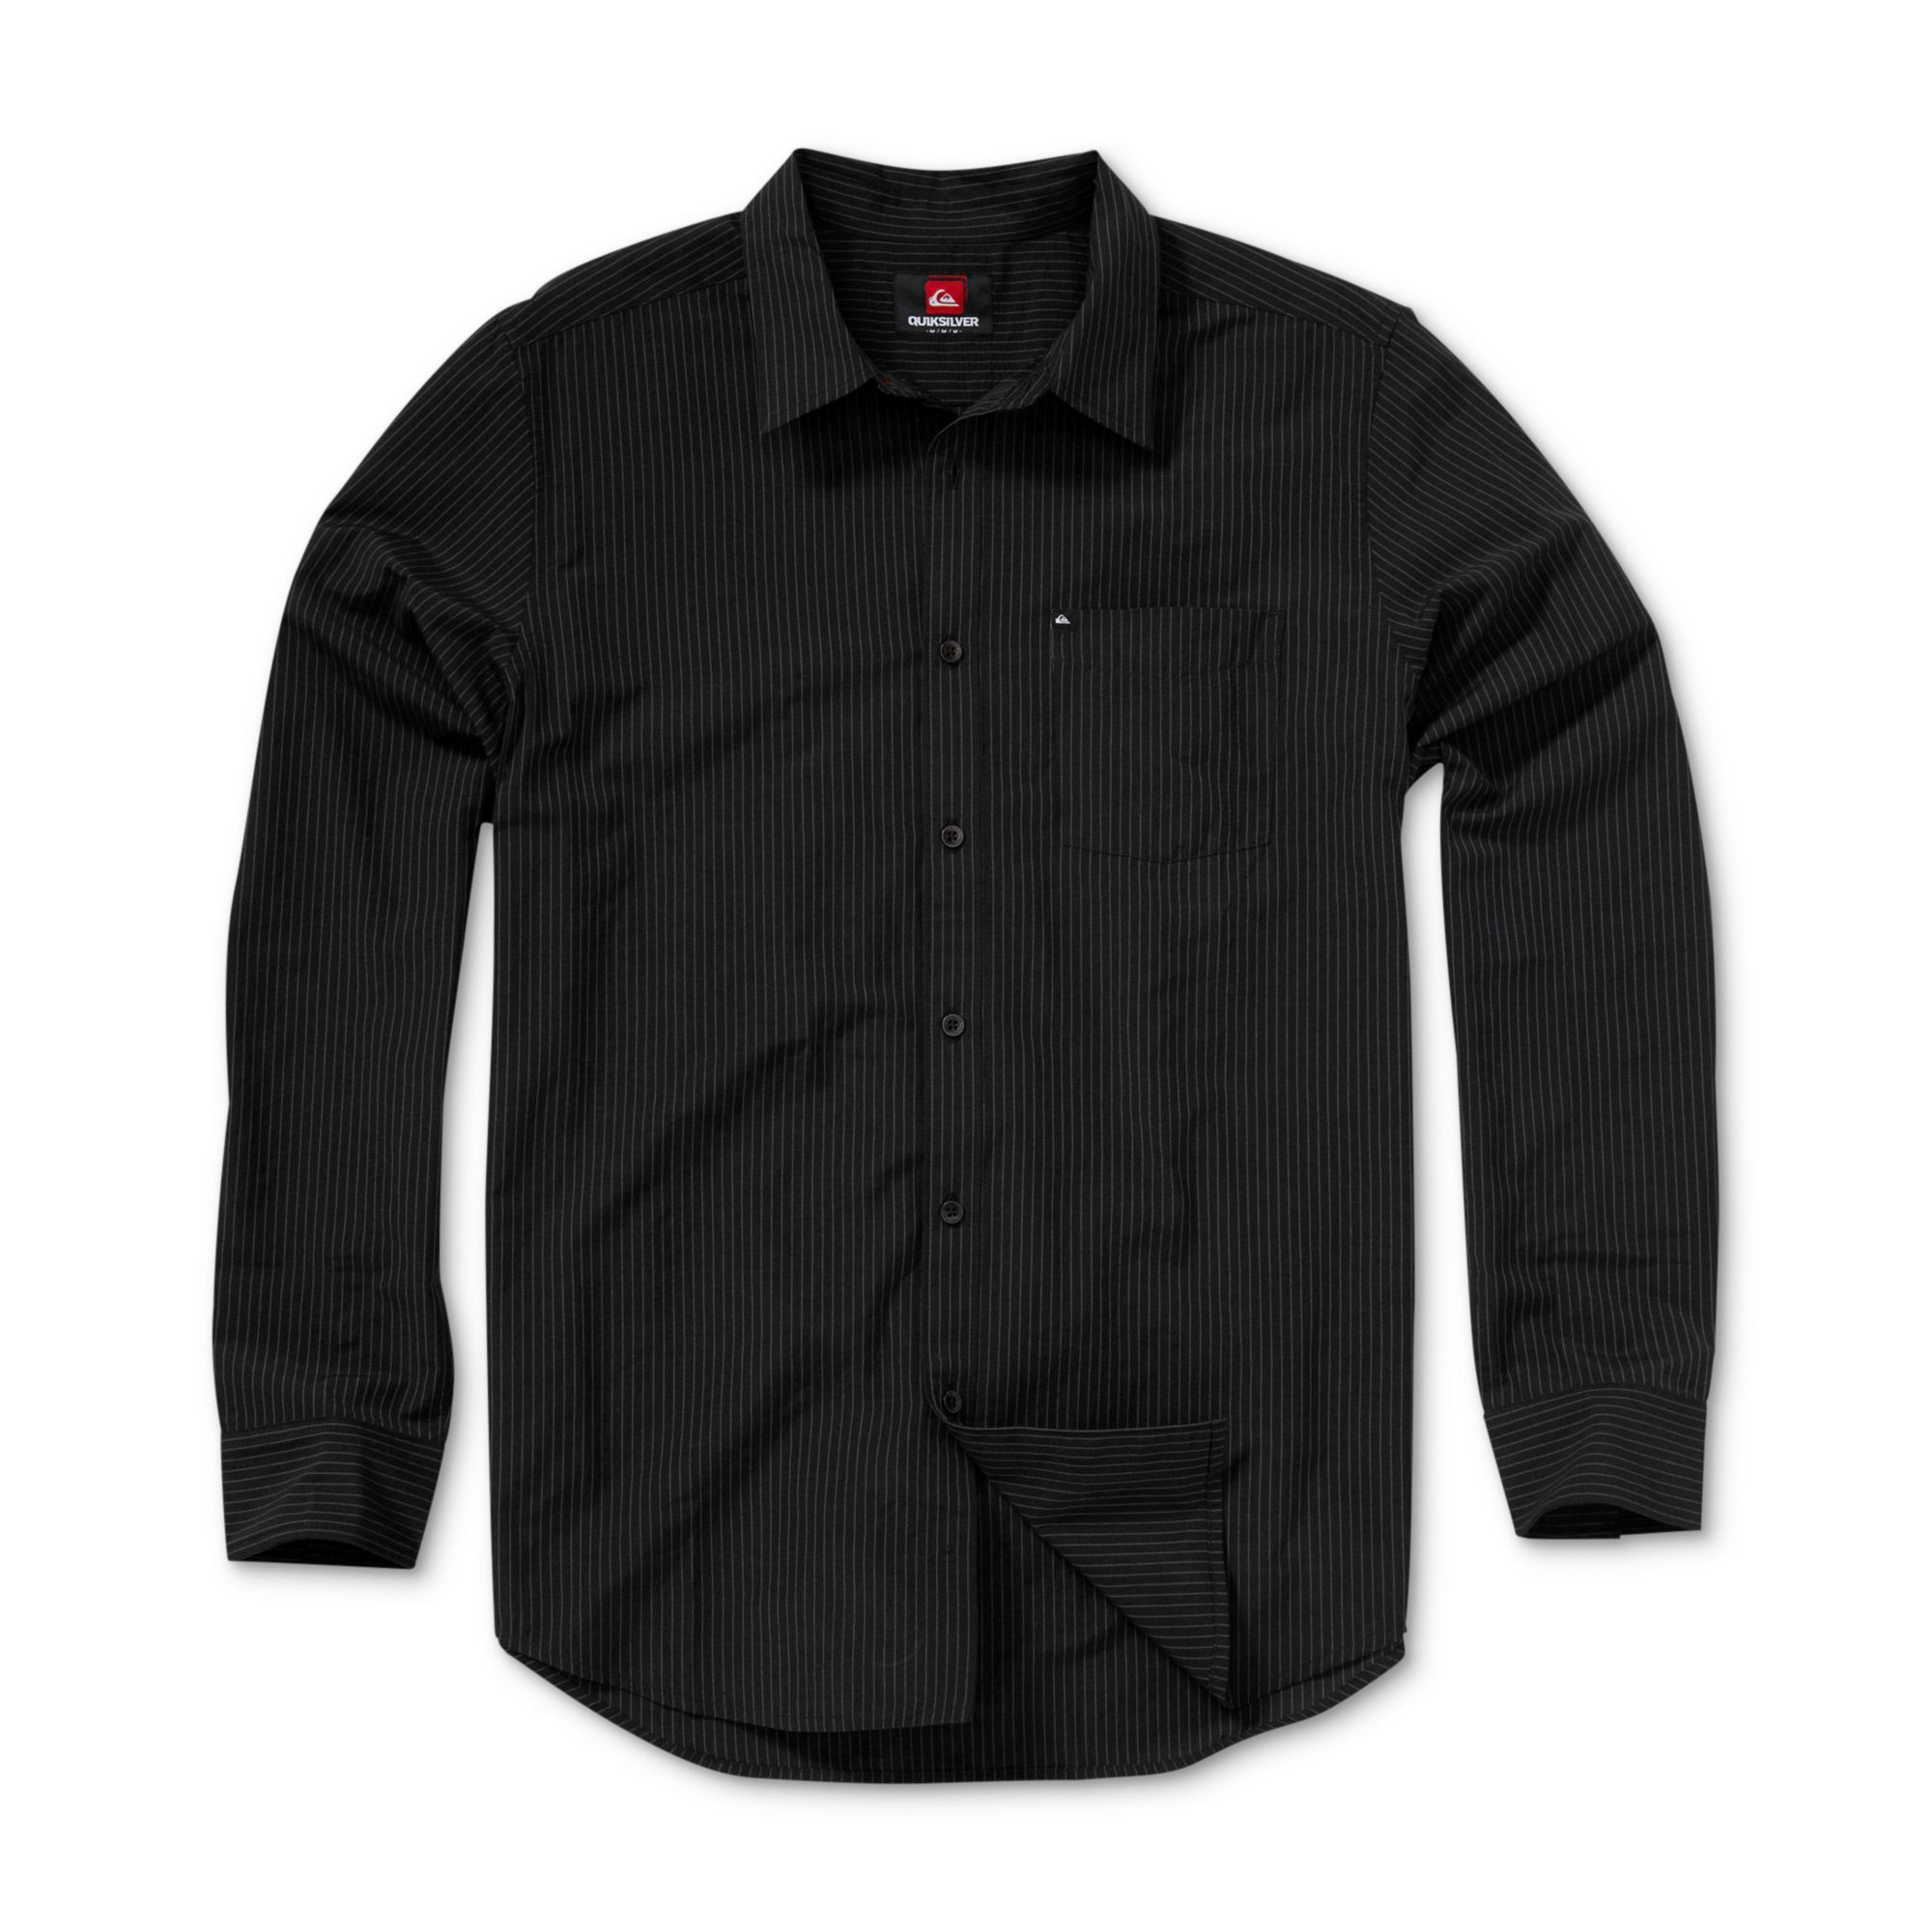 Quiksilver line work long sleeve shirt in black for men lyst for Black long sleeve work shirt